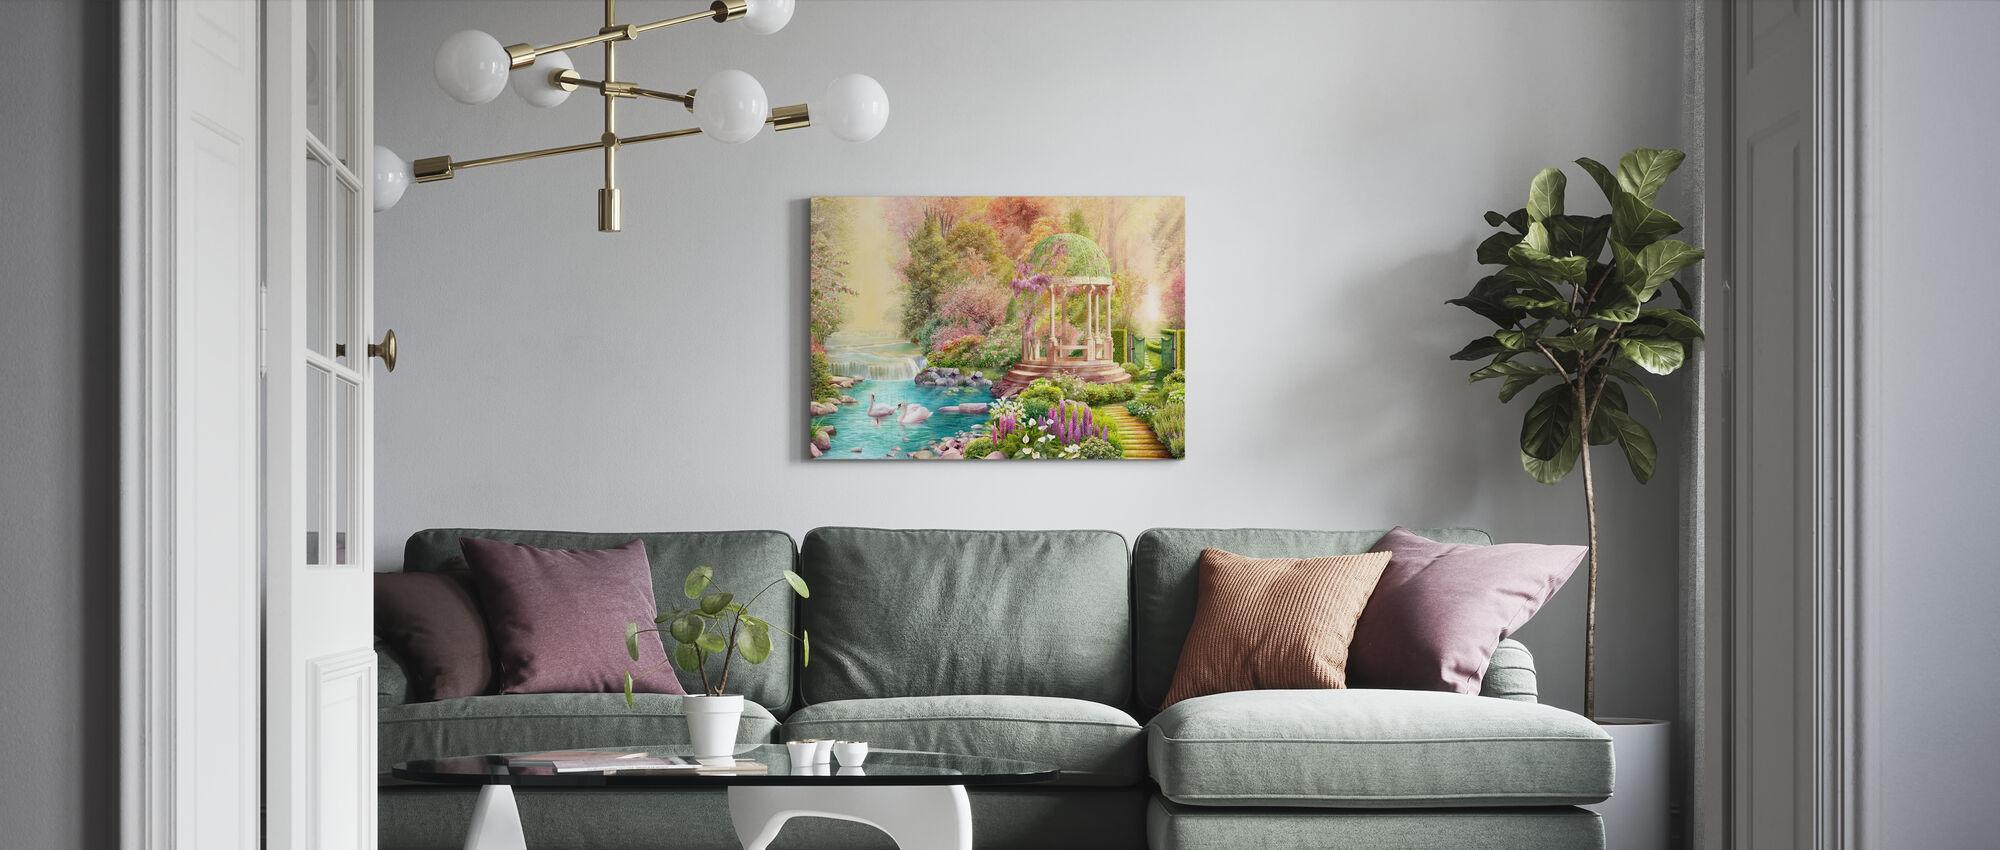 Swans Paradise - Canvas print - Living Room